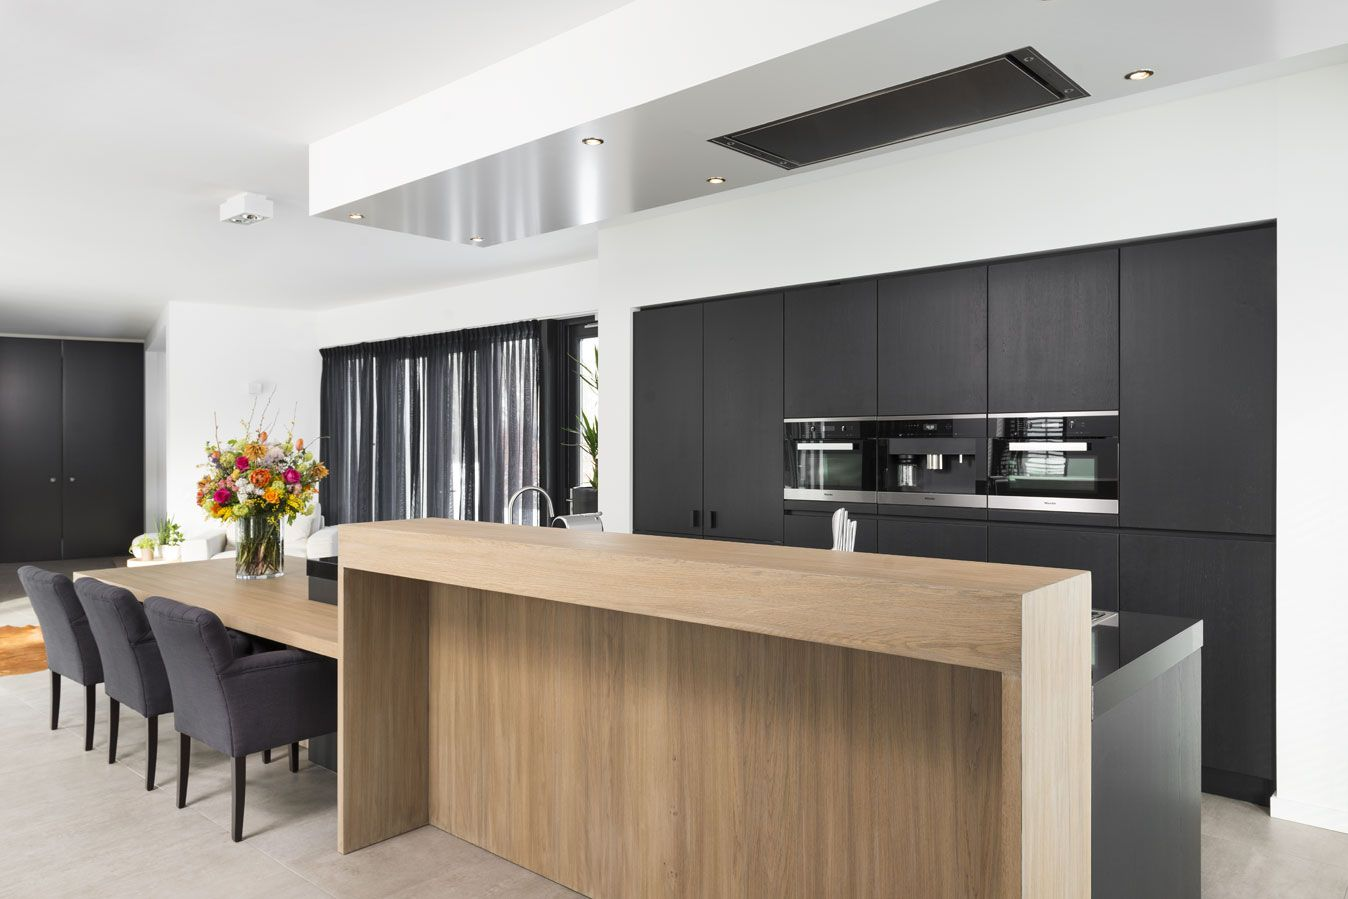 Keuken Moderne Bar : Keuken bar design moderne keuken met strakke houten bar modern